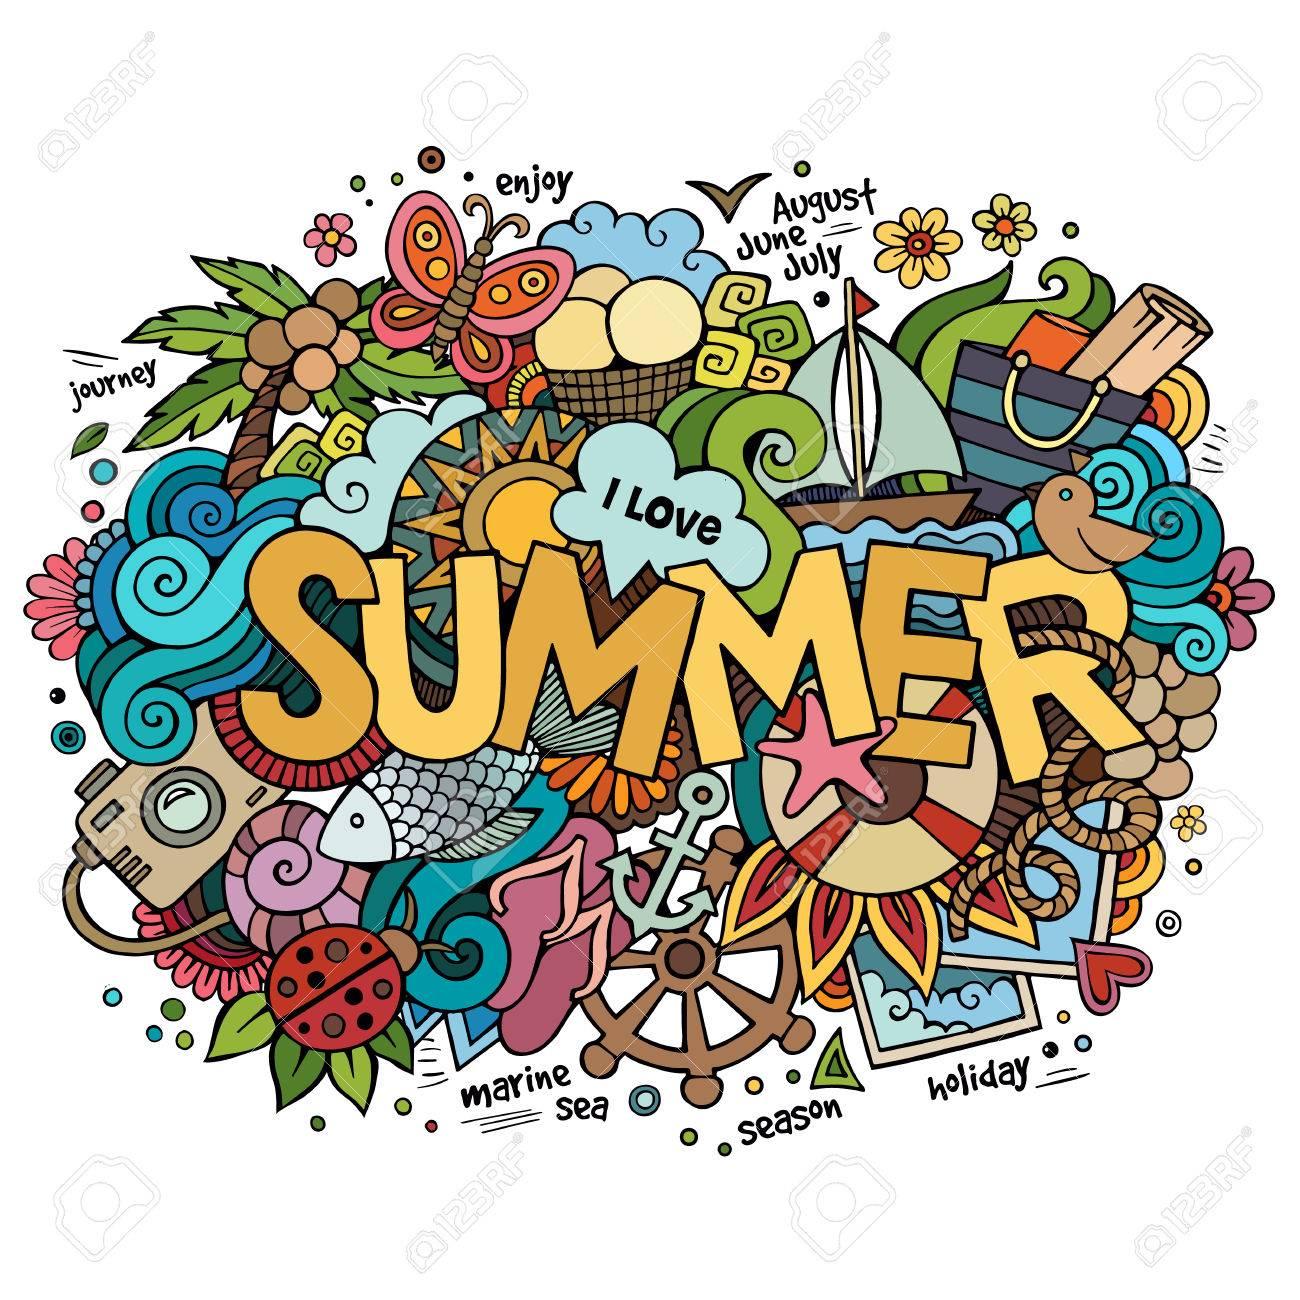 Summer hand lettering and doodles elements. Vector illustration - 40216364